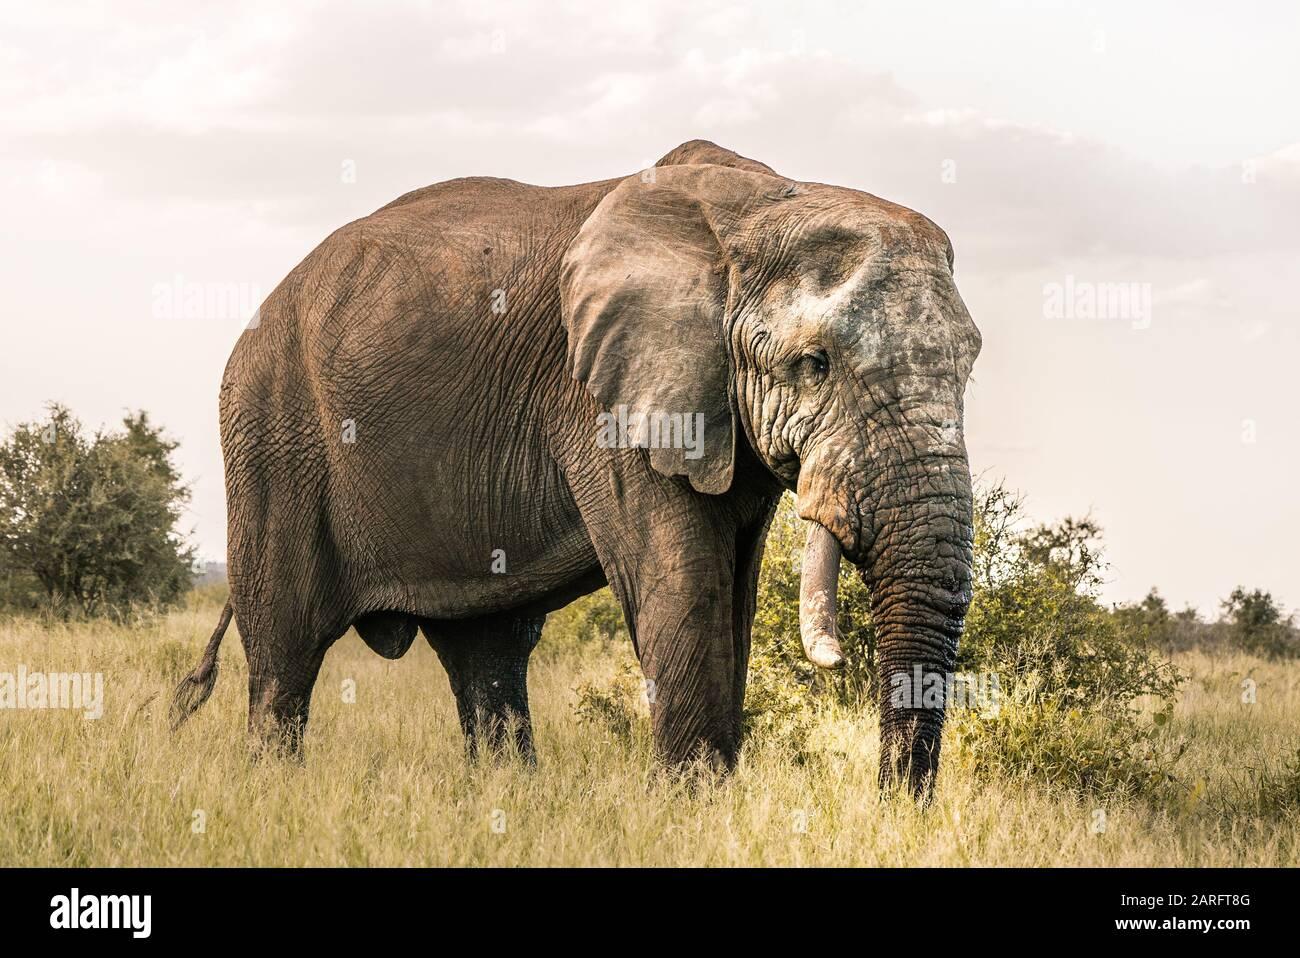 Big Elephant standing in africans wilderness, Kruger National Park Stock Photo